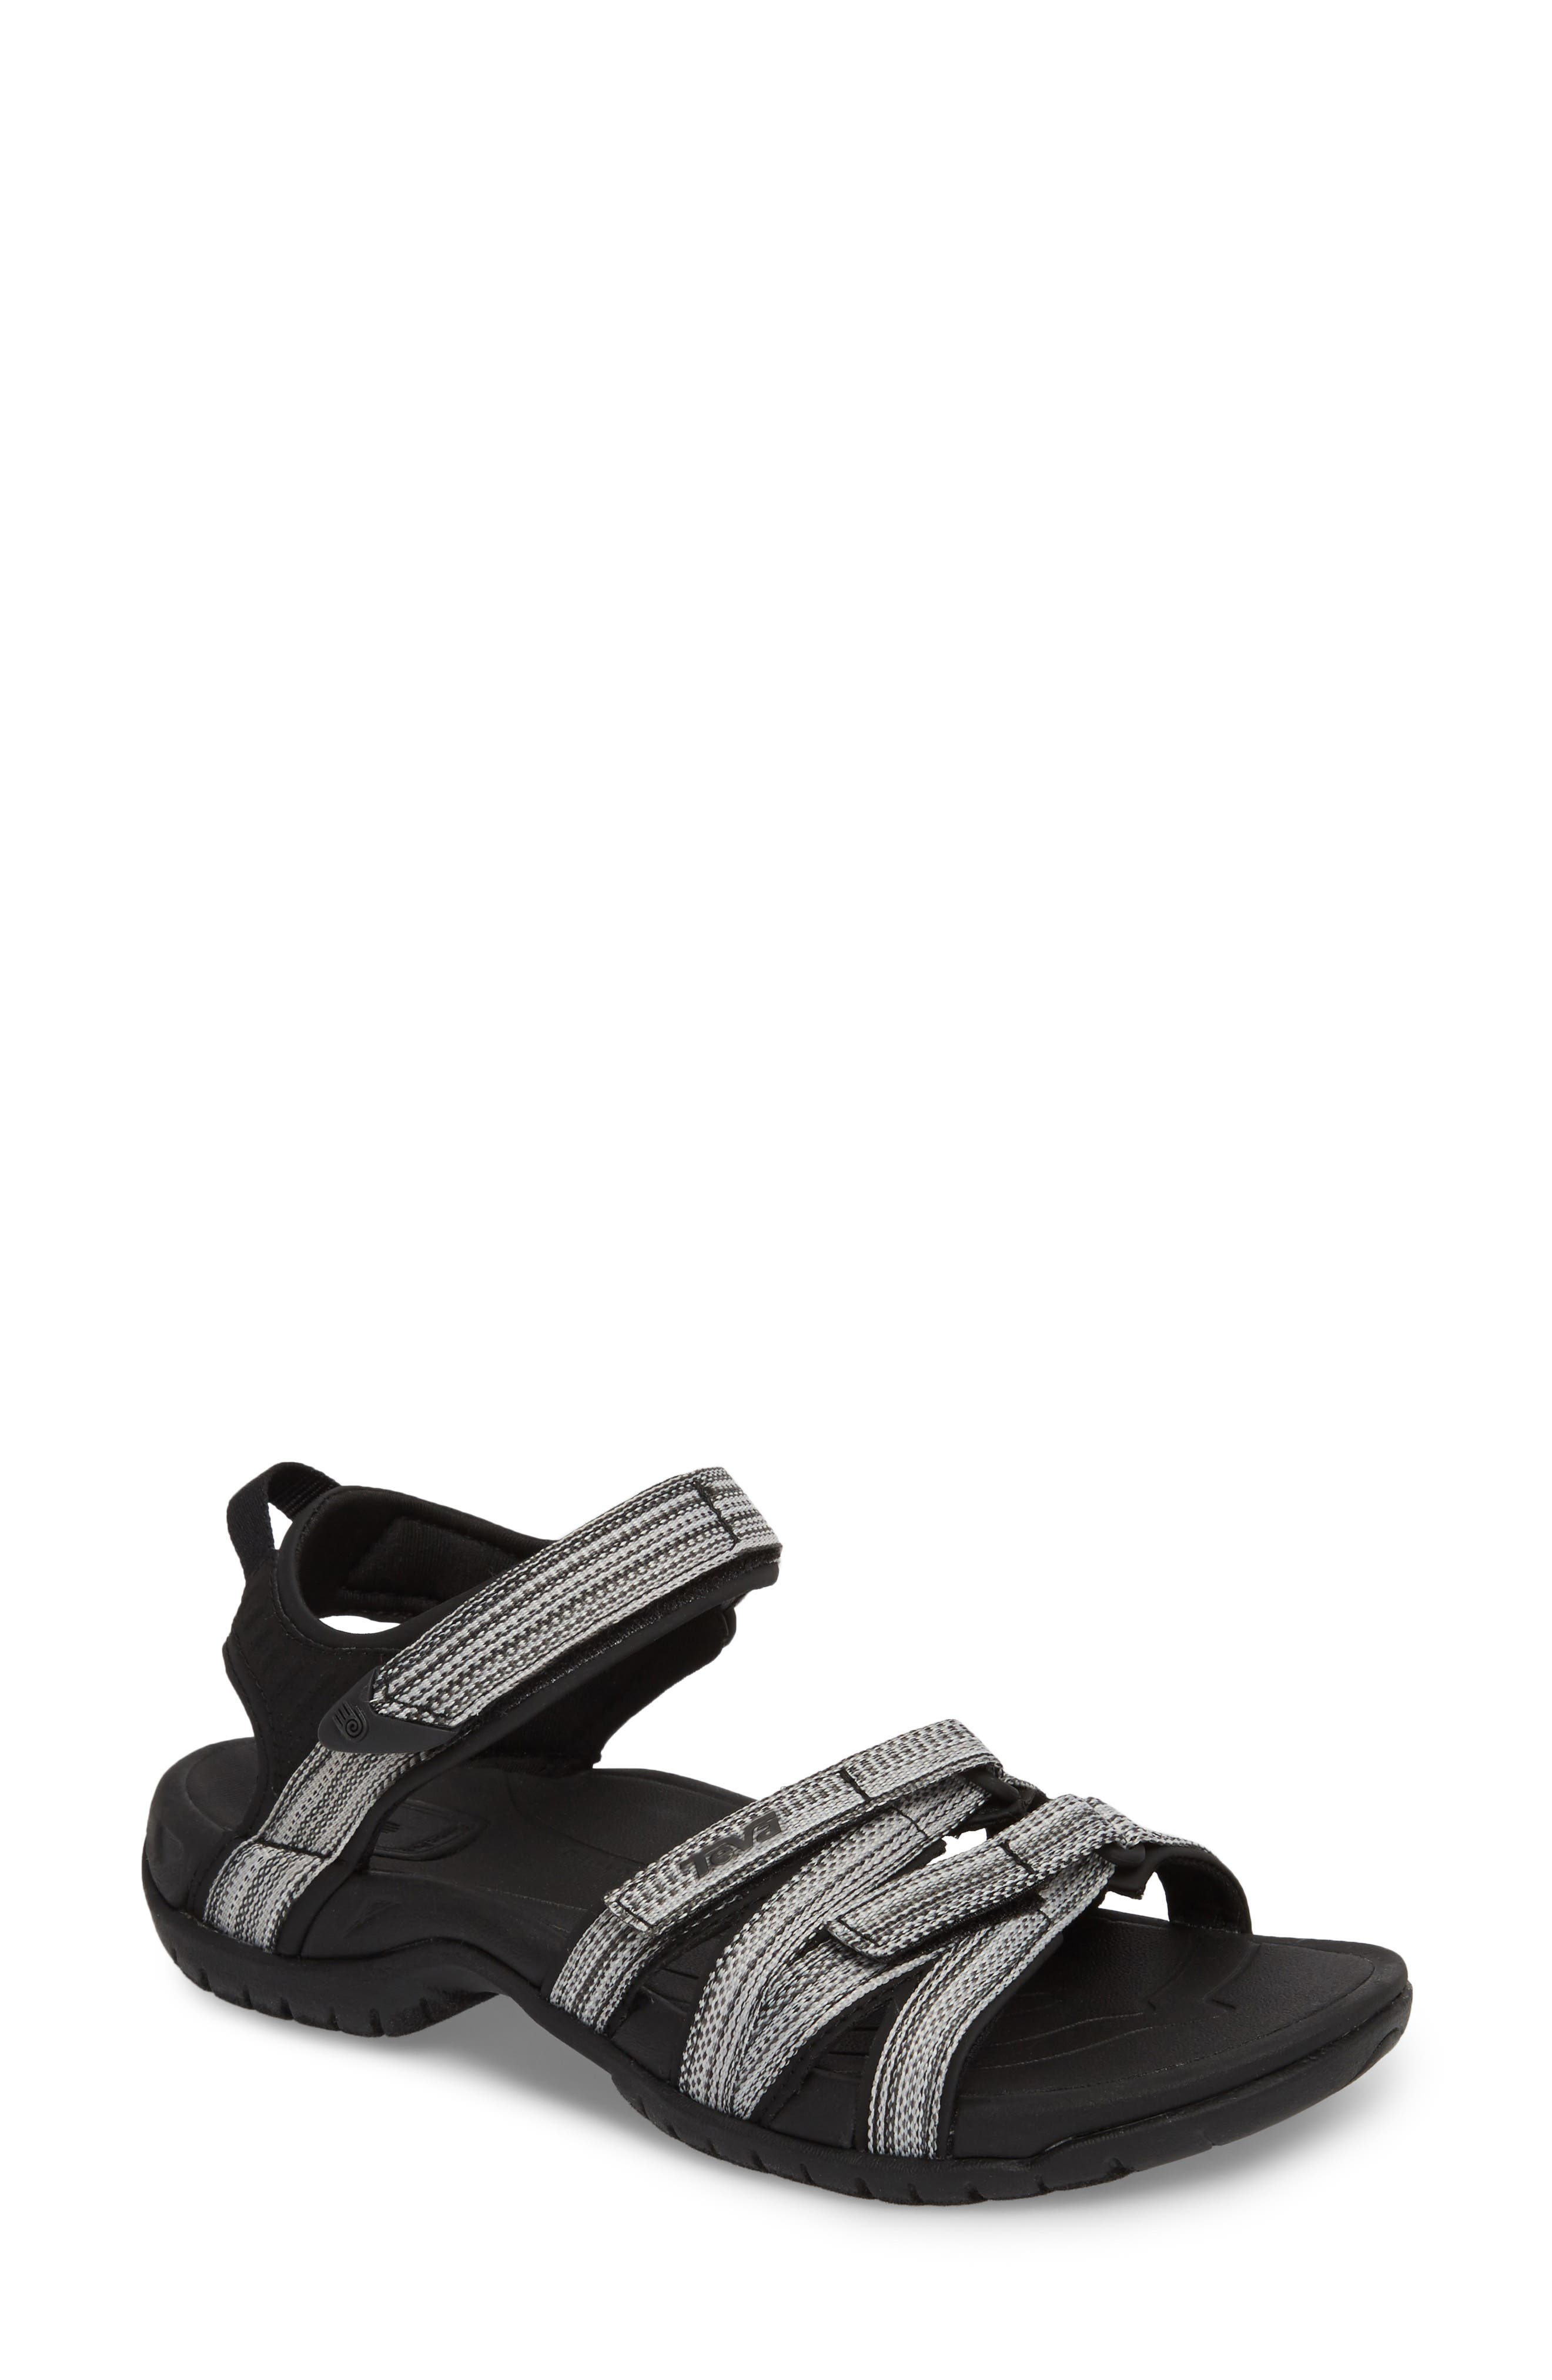 'Tirra' Sandal,                         Main,                         color, Black/ White Multi Fabric